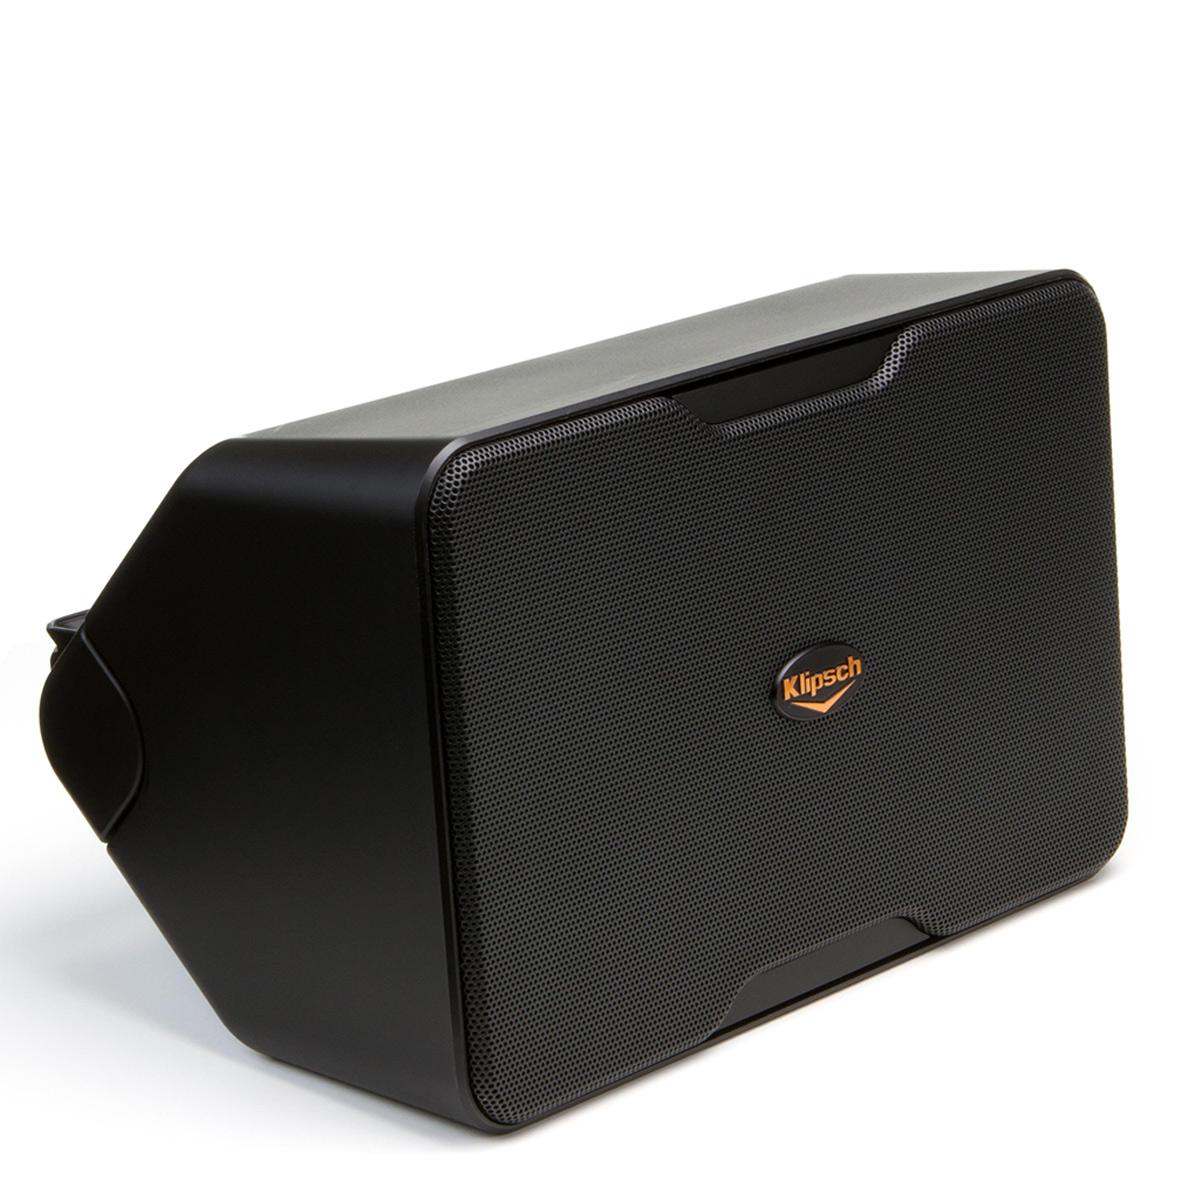 Klipsch-CP-6-Compact-Performance-Series-Outdoor-Loudspeakers-Pair thumbnail 5